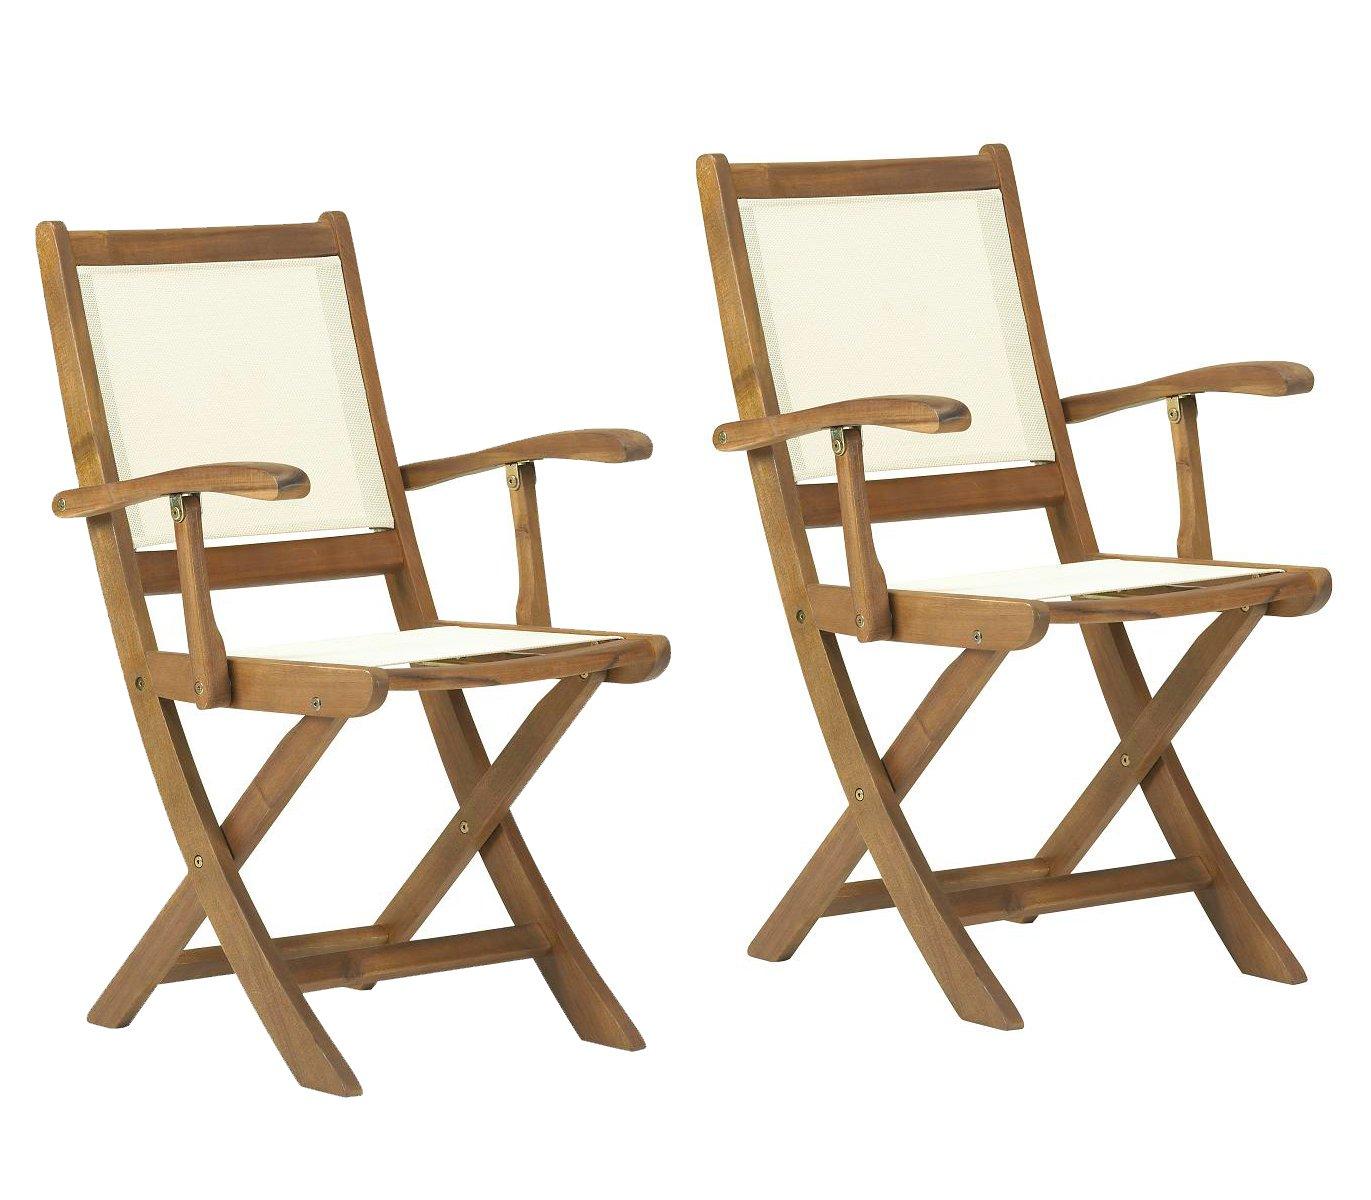 Henley Low Back Folding Armchair [Set of 2] Royalcraft 2xATC-3TIV